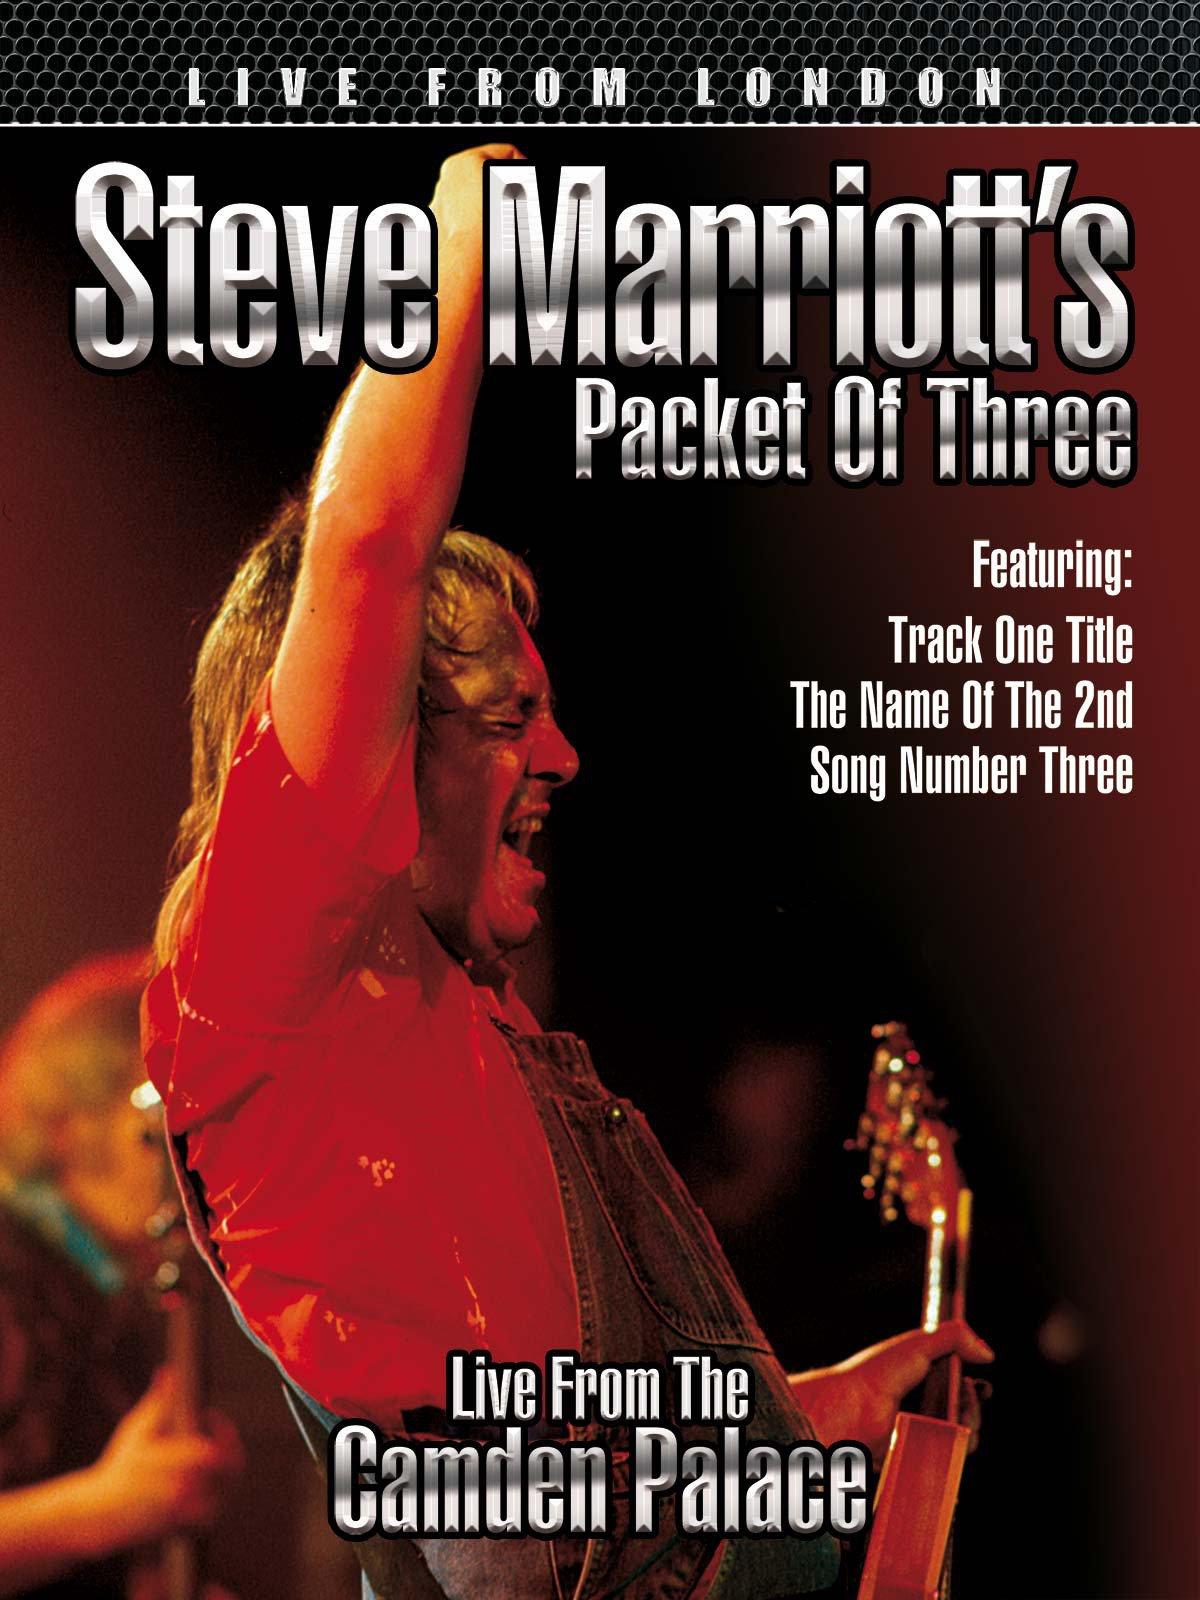 Steve Marriott's Packet Of Three